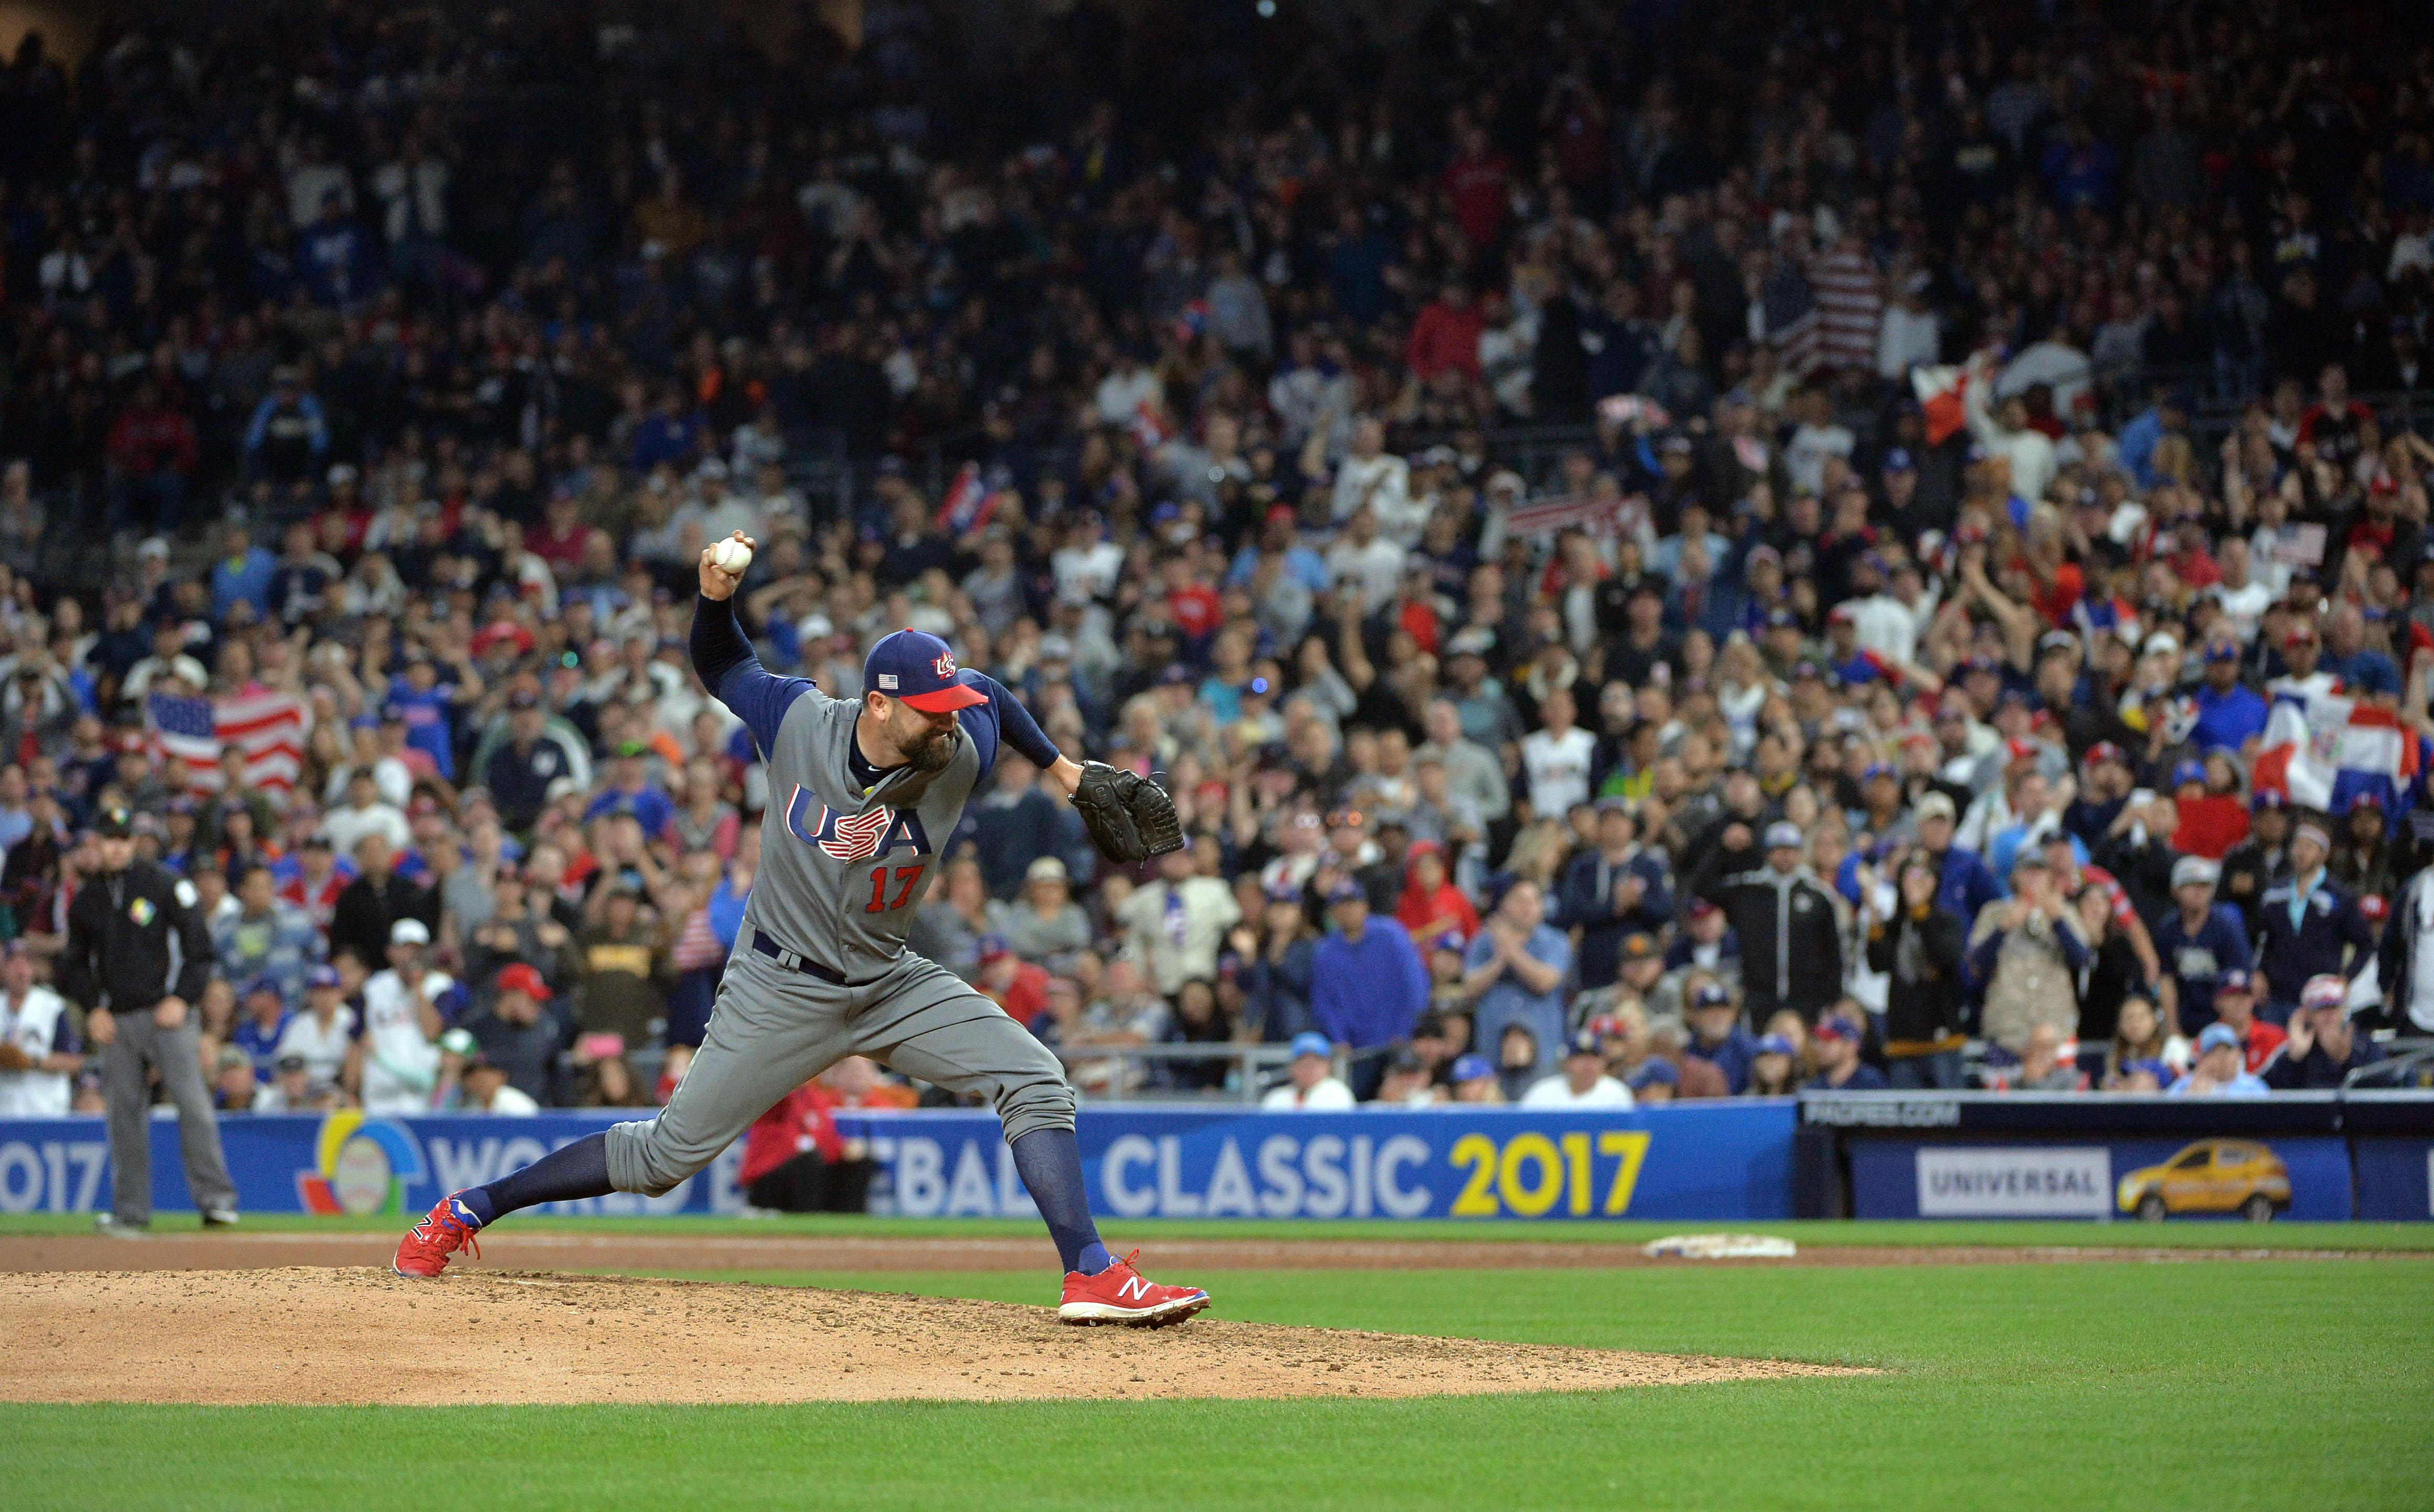 9955675-baseball-world-baseball-classic-usa-at-dominican-republic